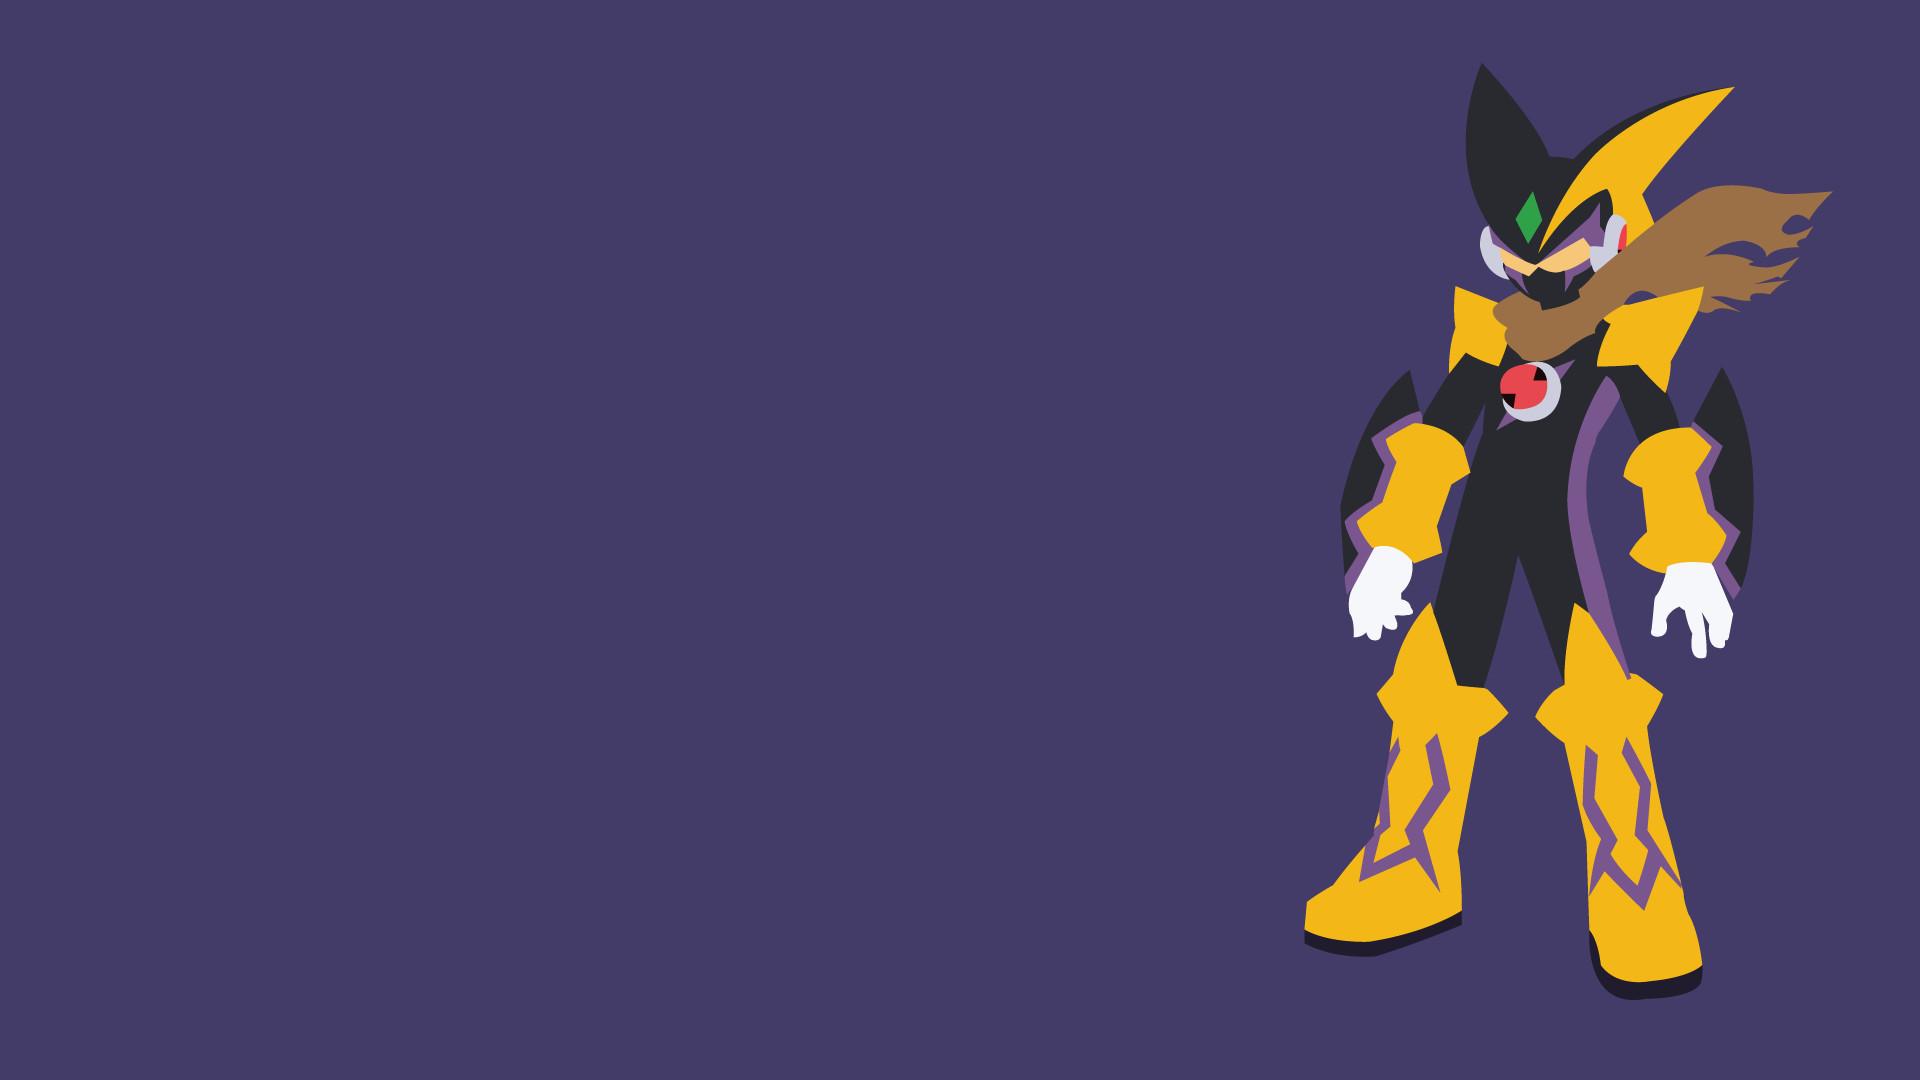 Megaman Battle Network High Quality Wallpaper #5610908